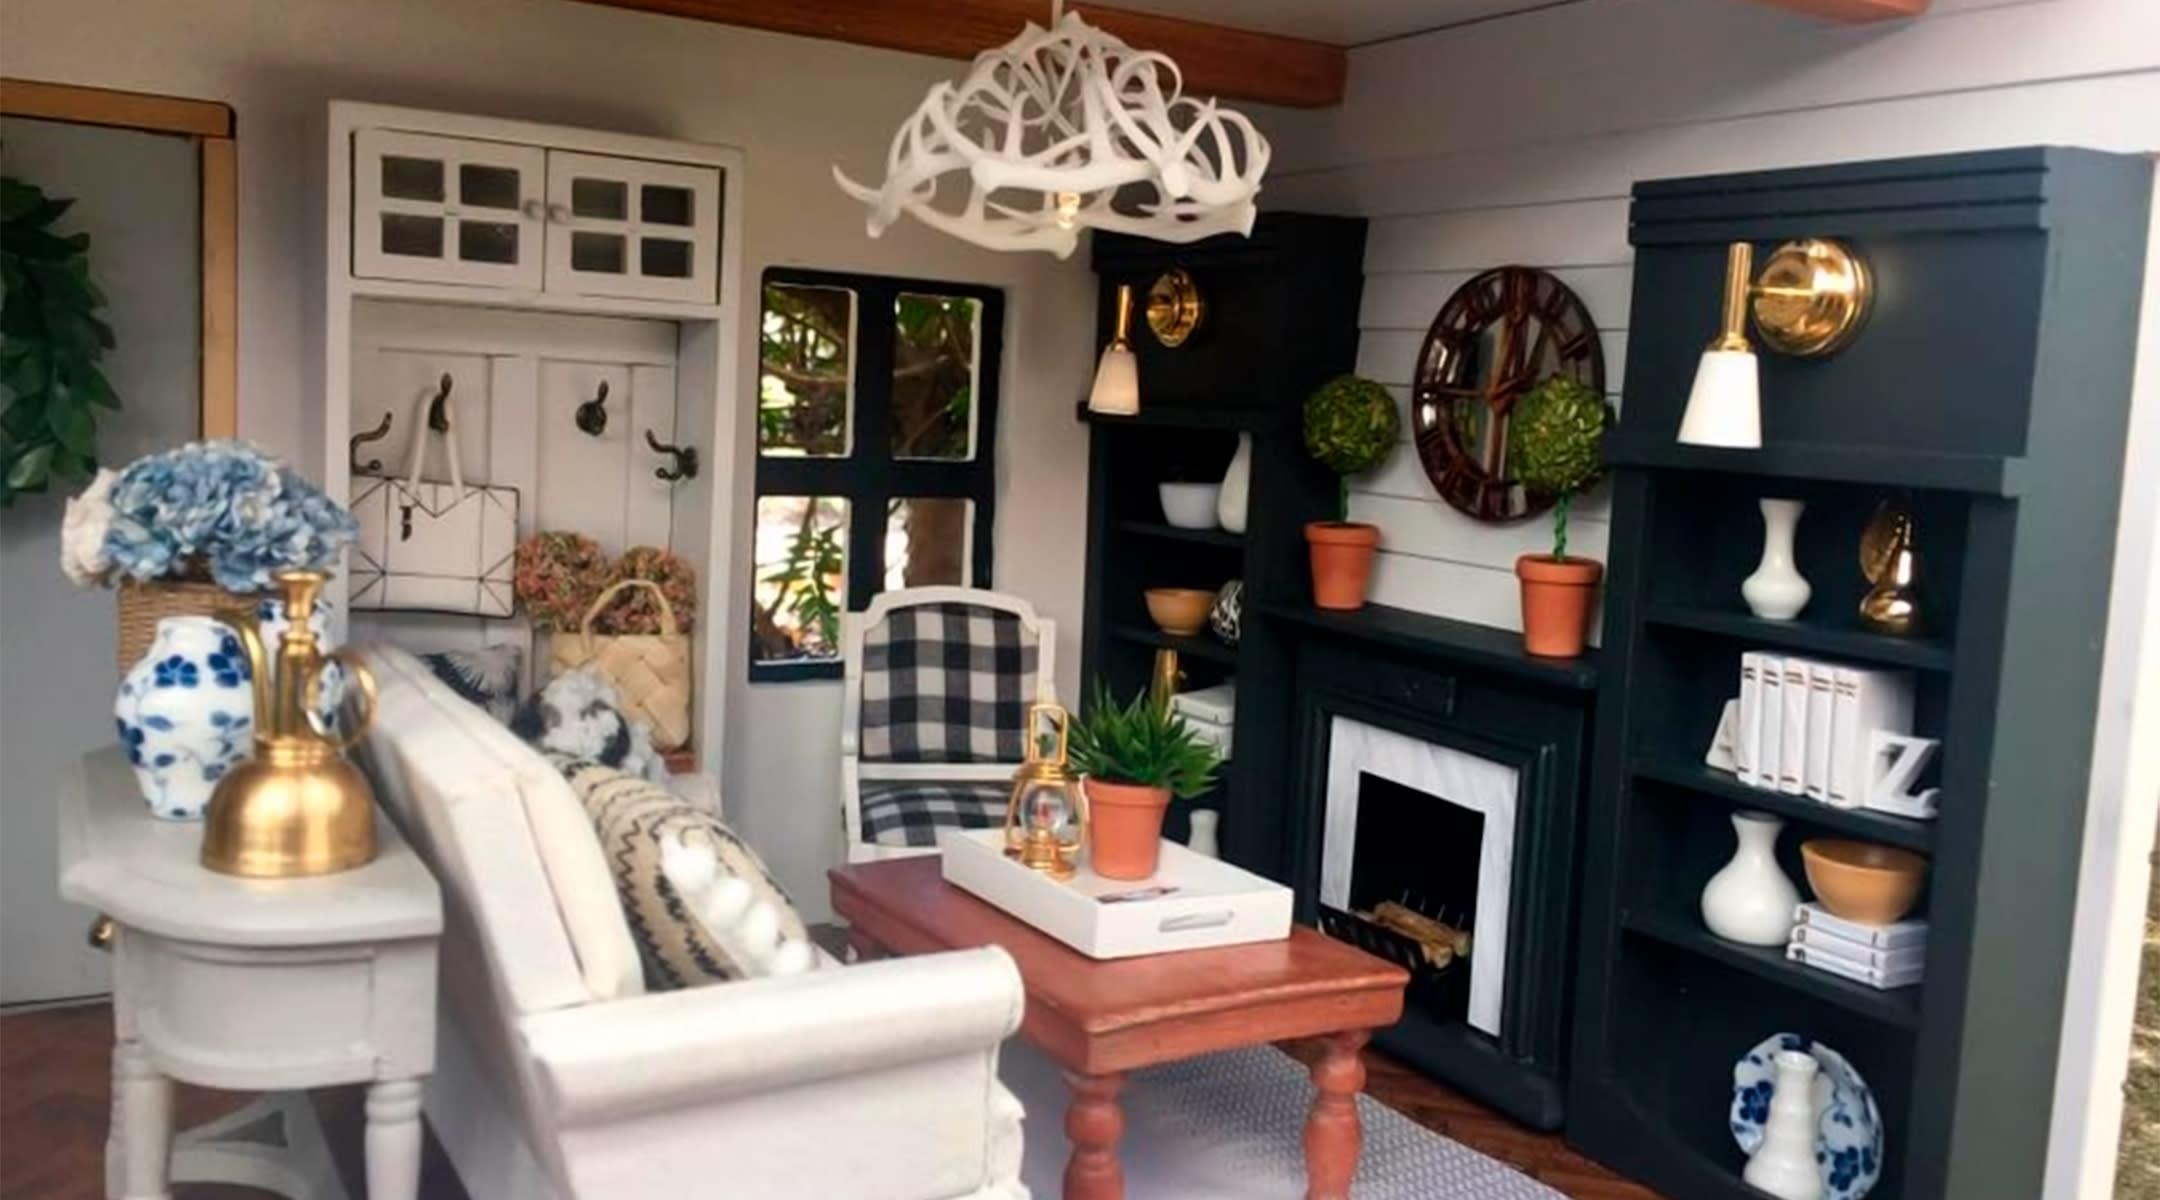 Mom Renovates Dollhouse In Fixer Upper Style